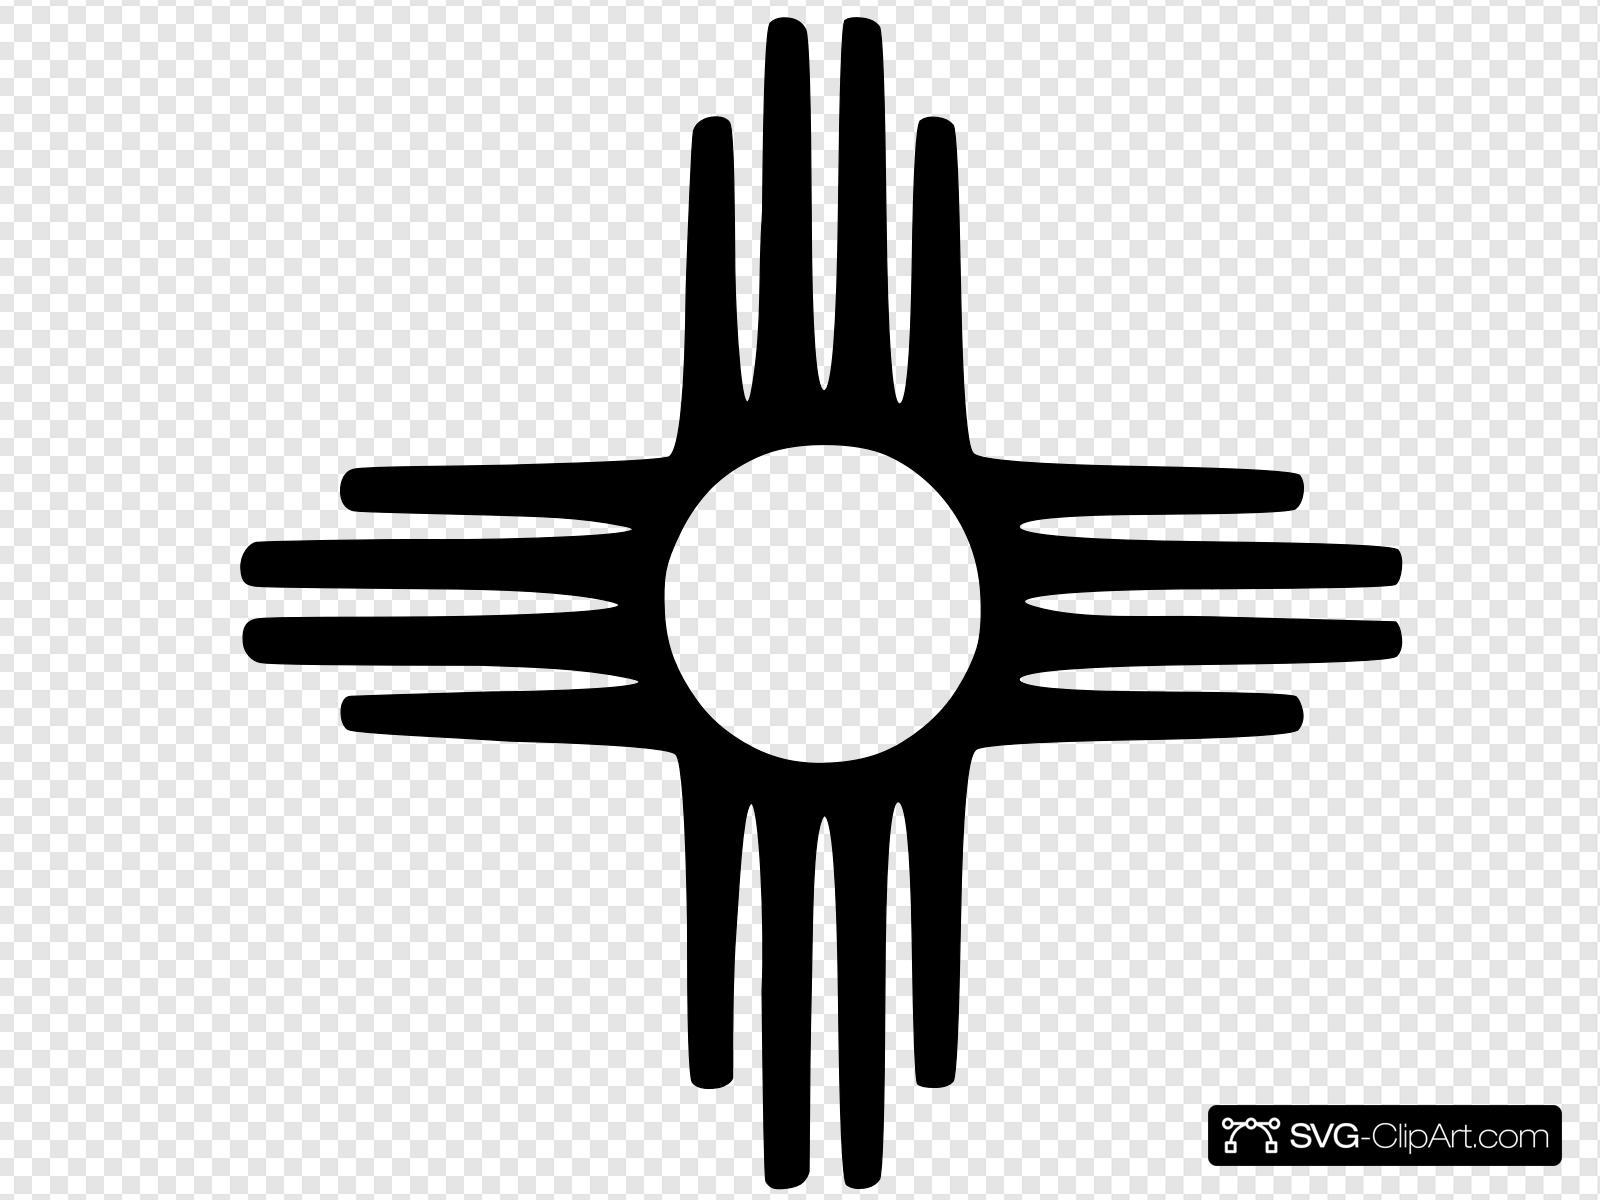 New Mexico Zia By Nicola Clip art, Icon and SVG.